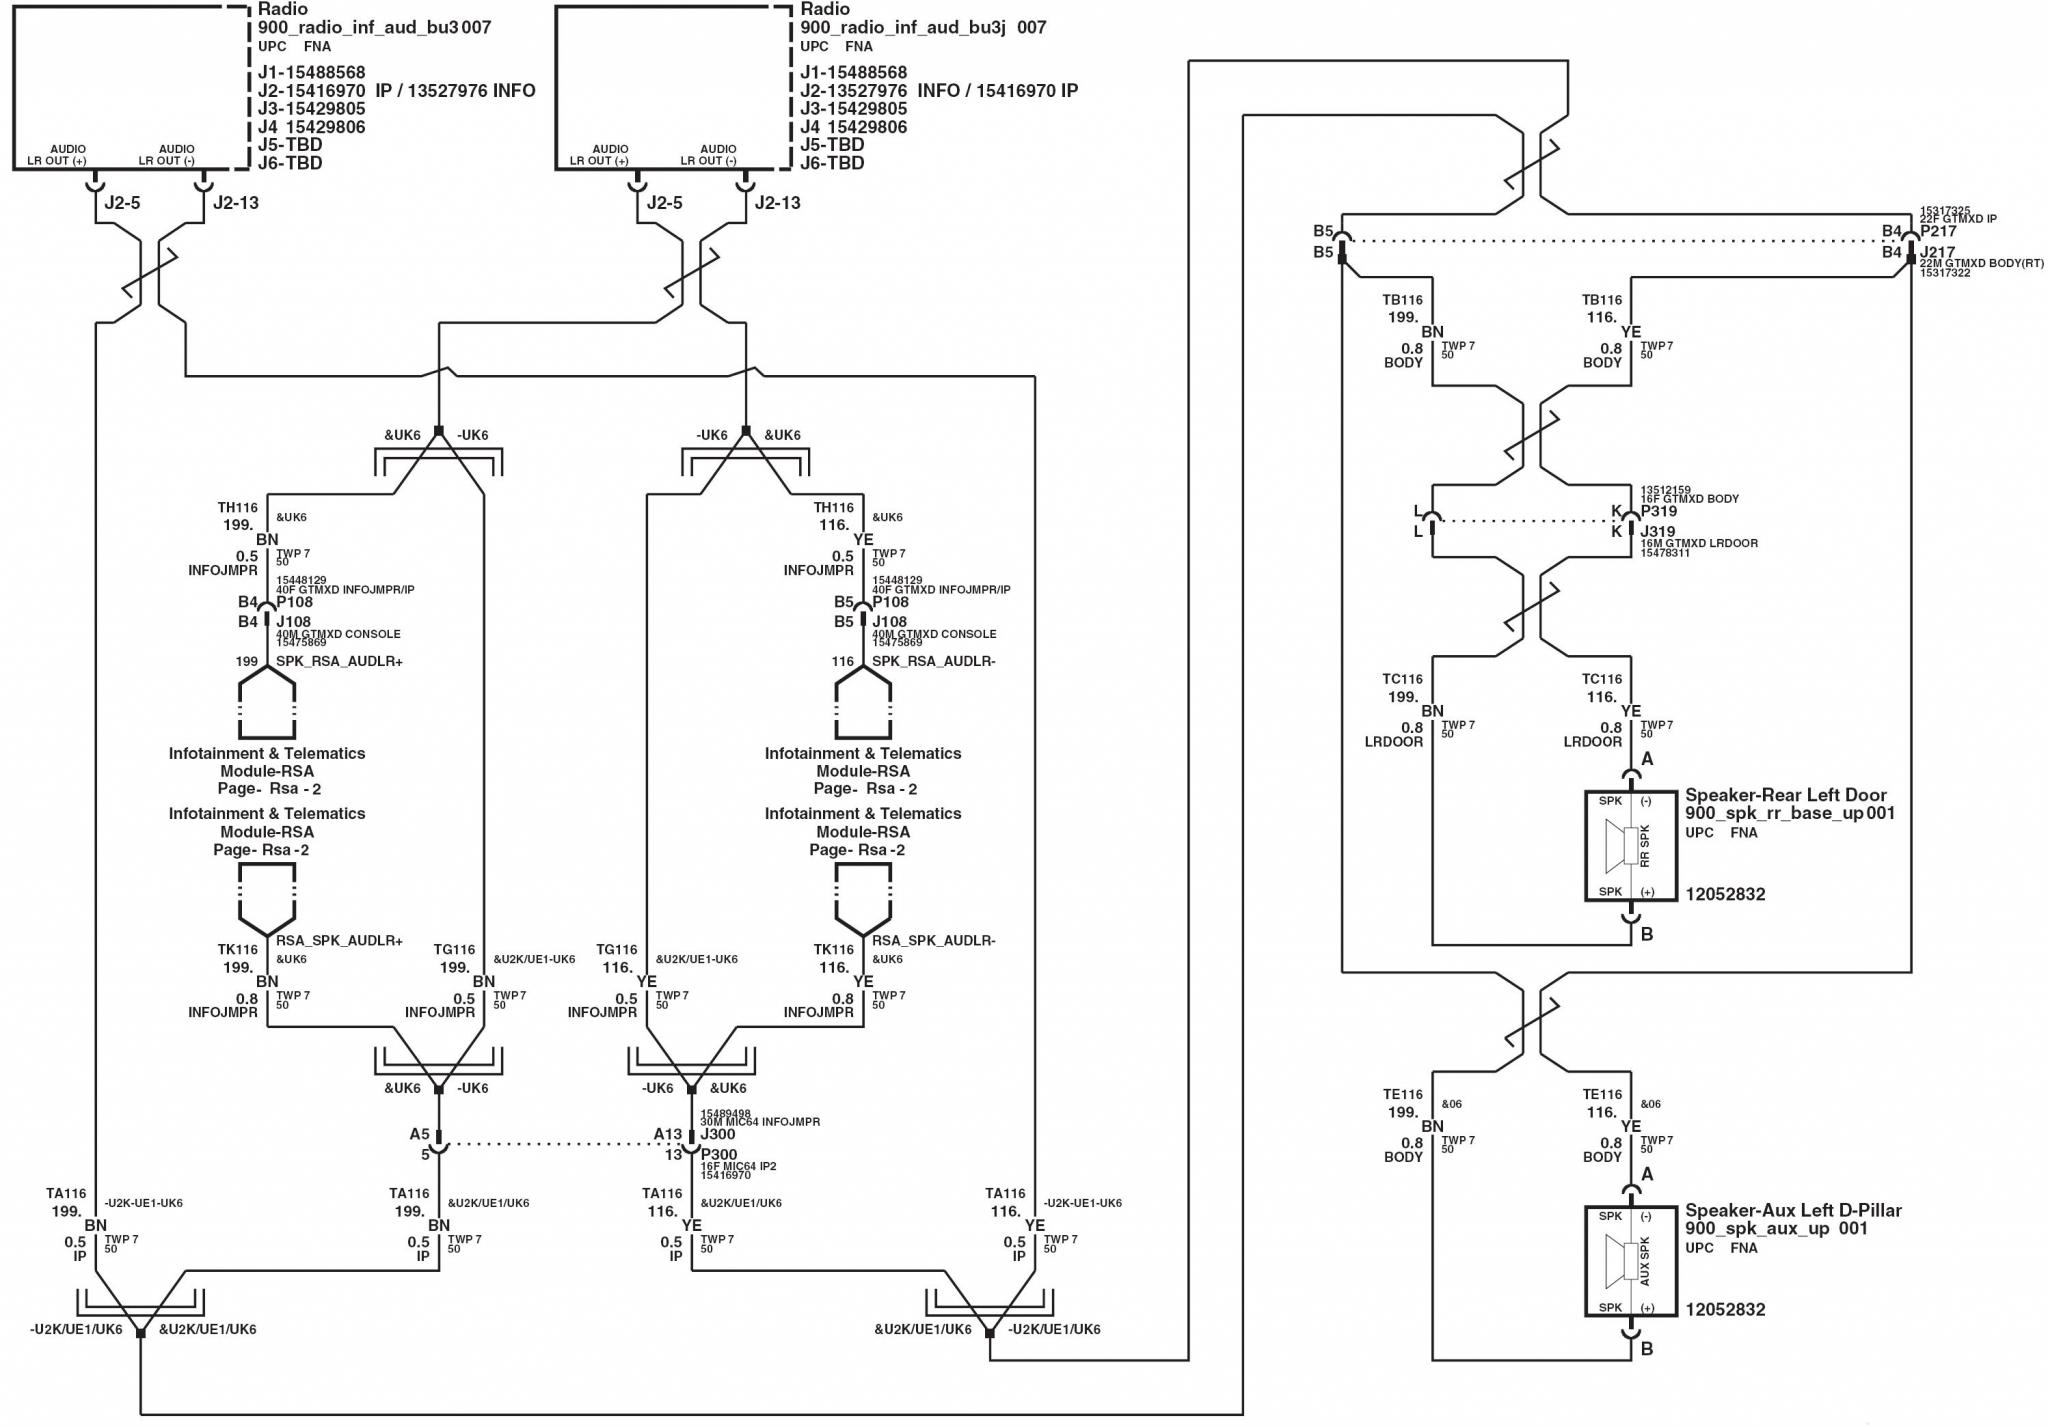 08 Chevrolet Tahoe Radio Wiring Diagram from www.chevyavalanchefanclub.com